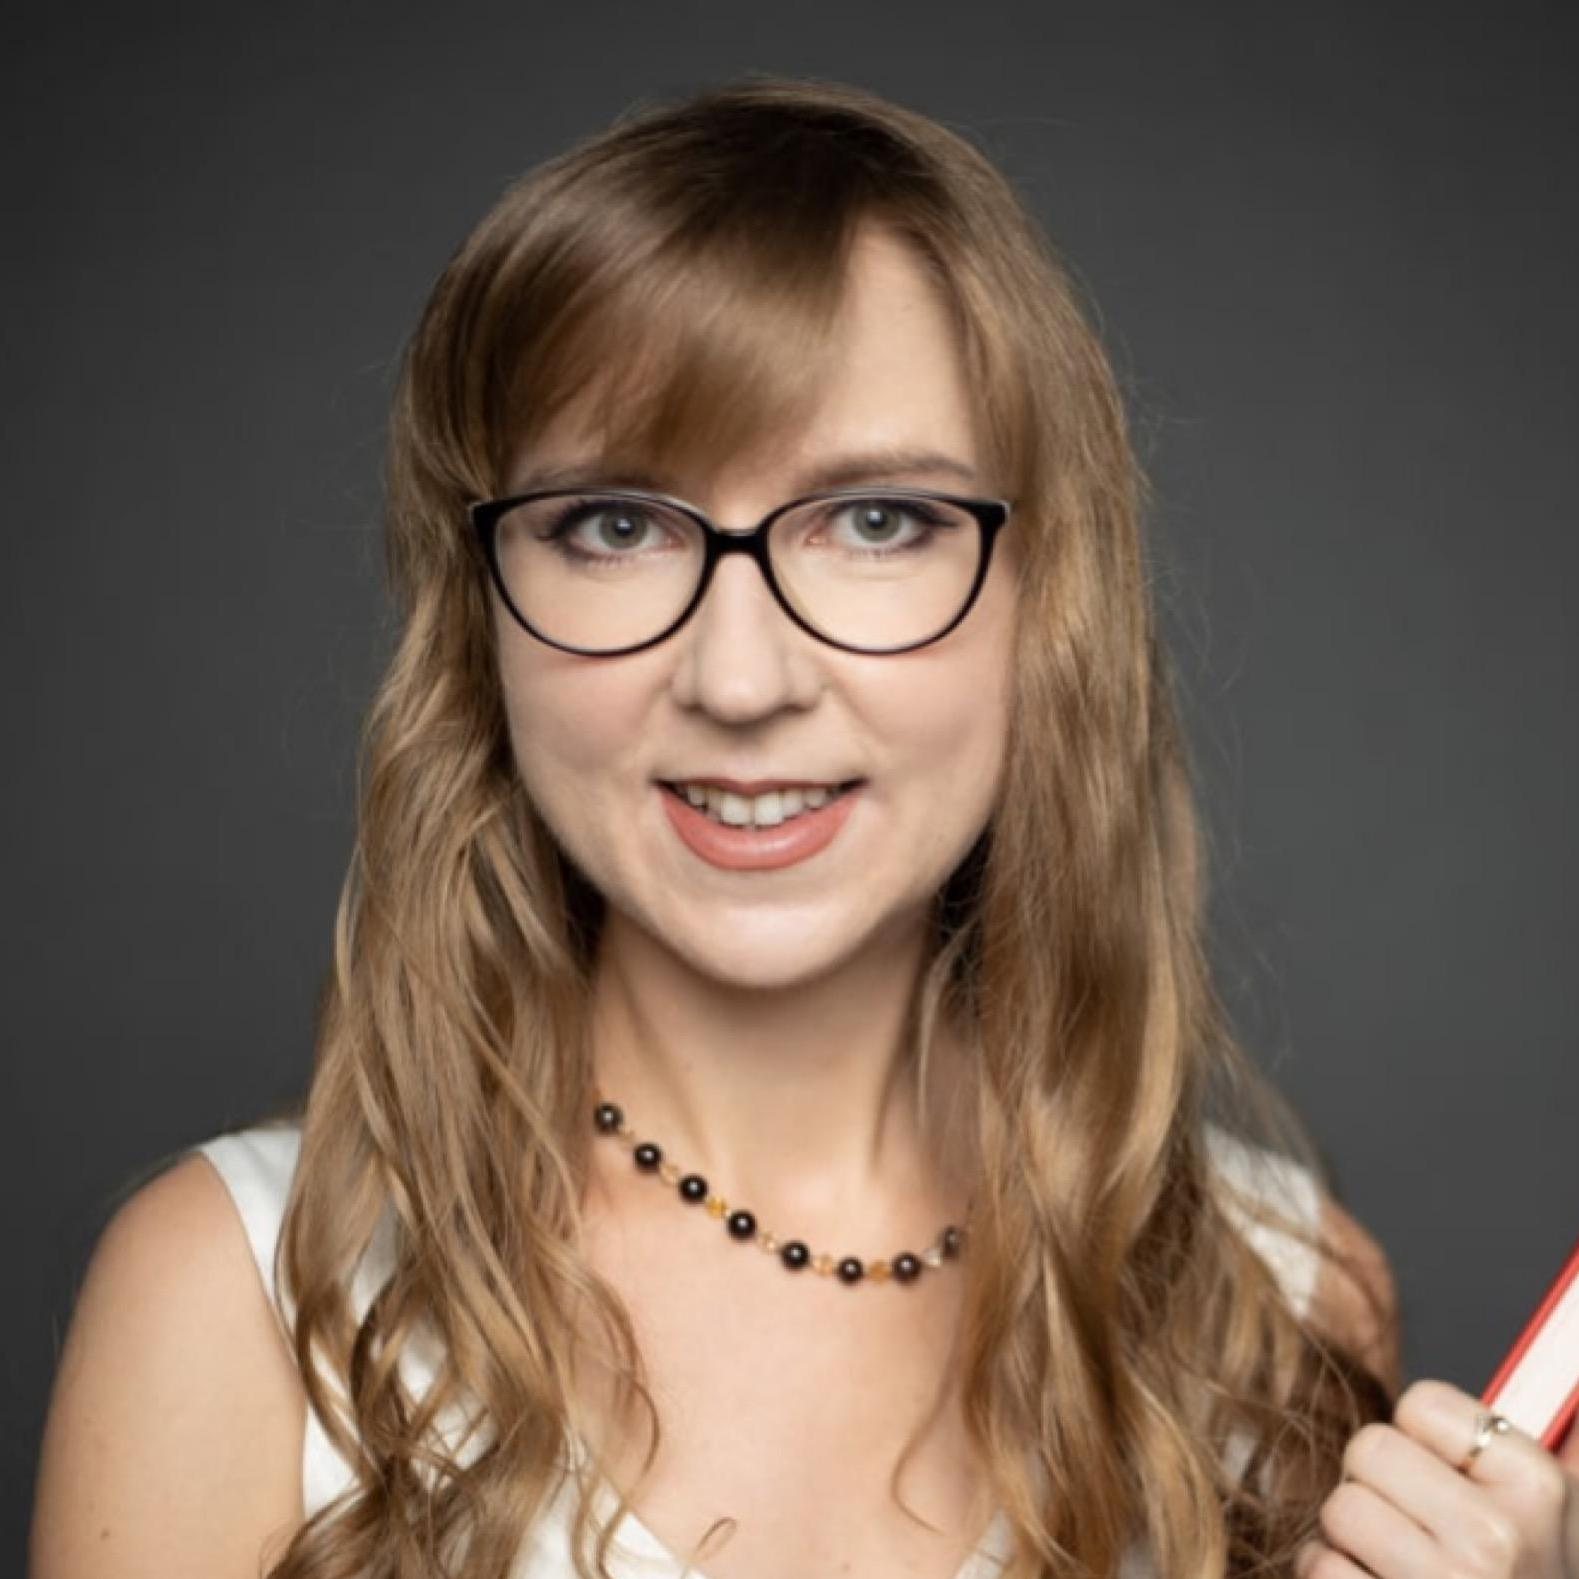 Olena De Lira's Profile Photo